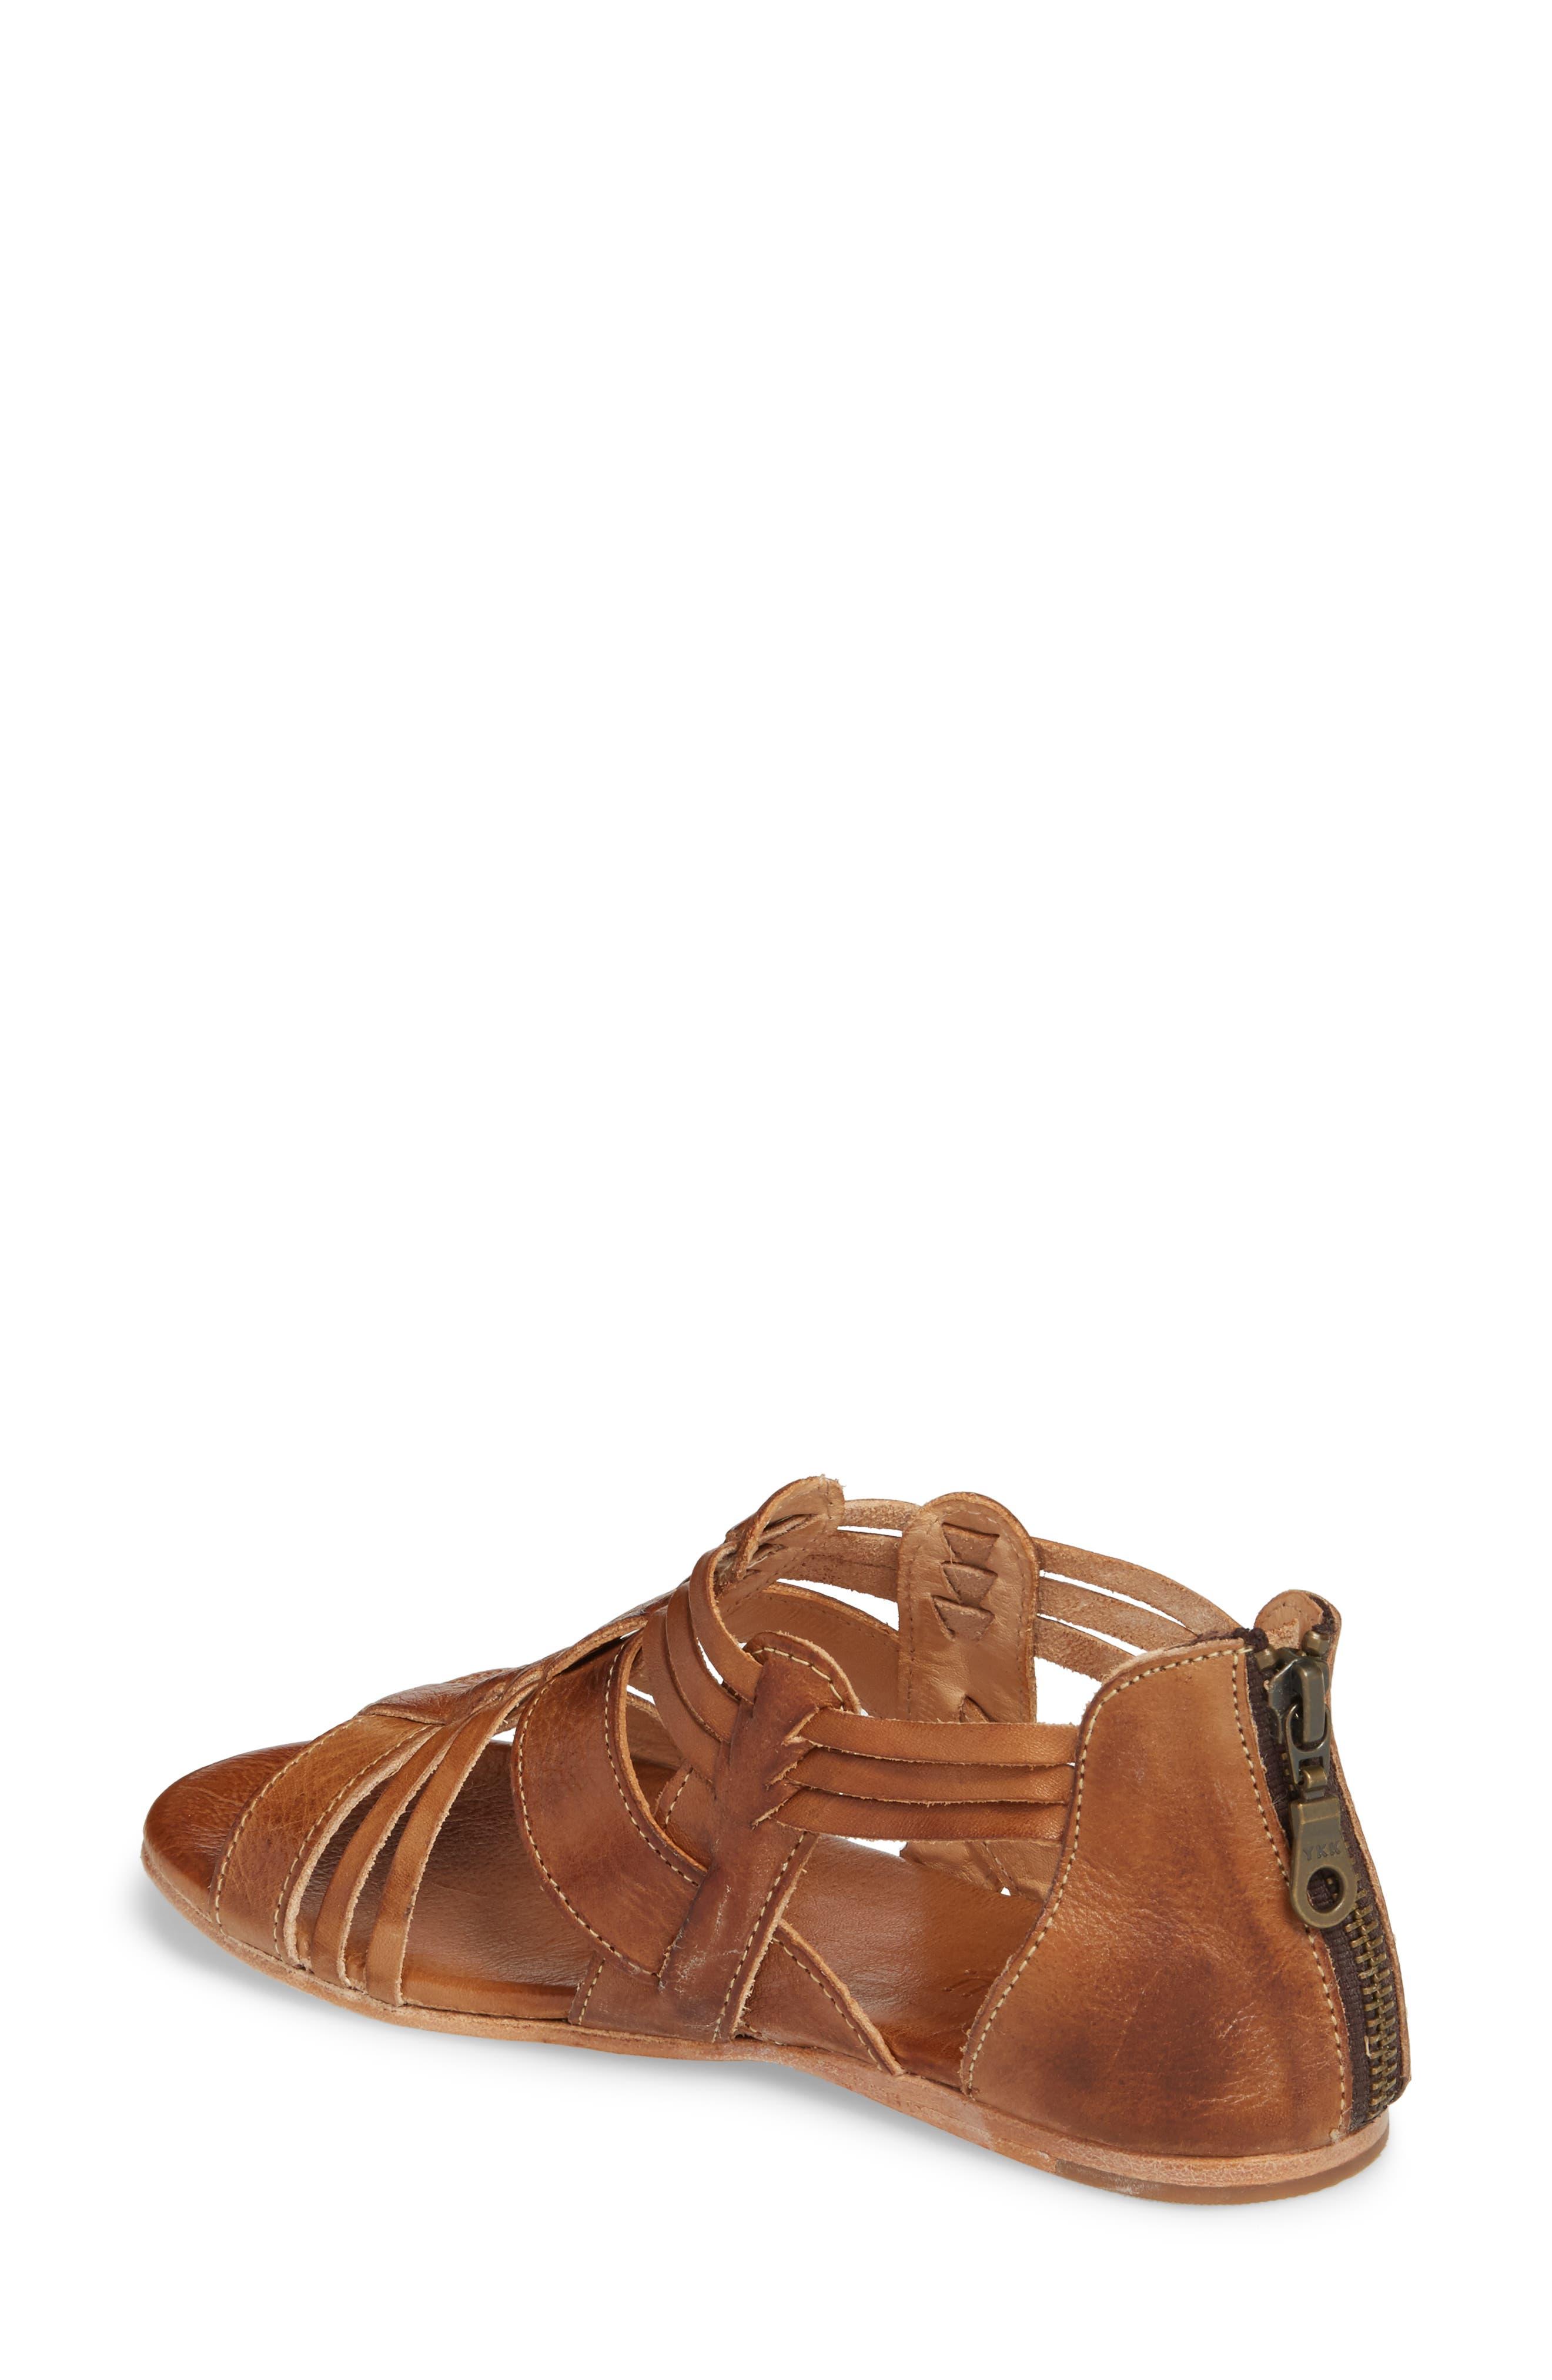 Cara Sandal,                             Alternate thumbnail 2, color,                             Tan Leather